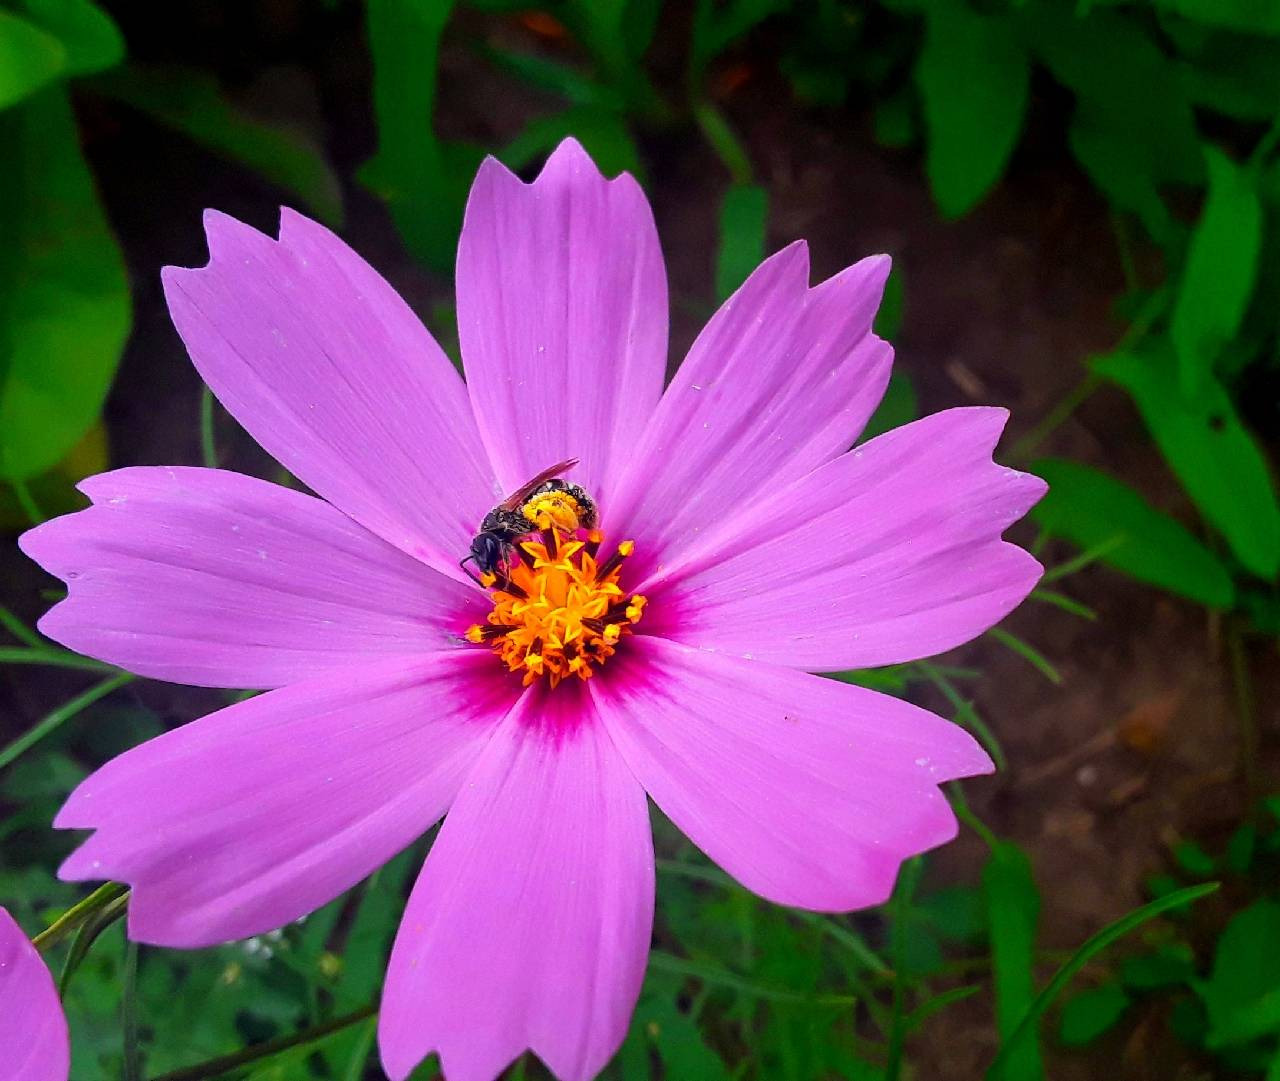 пчела на цветке фотография Sergei